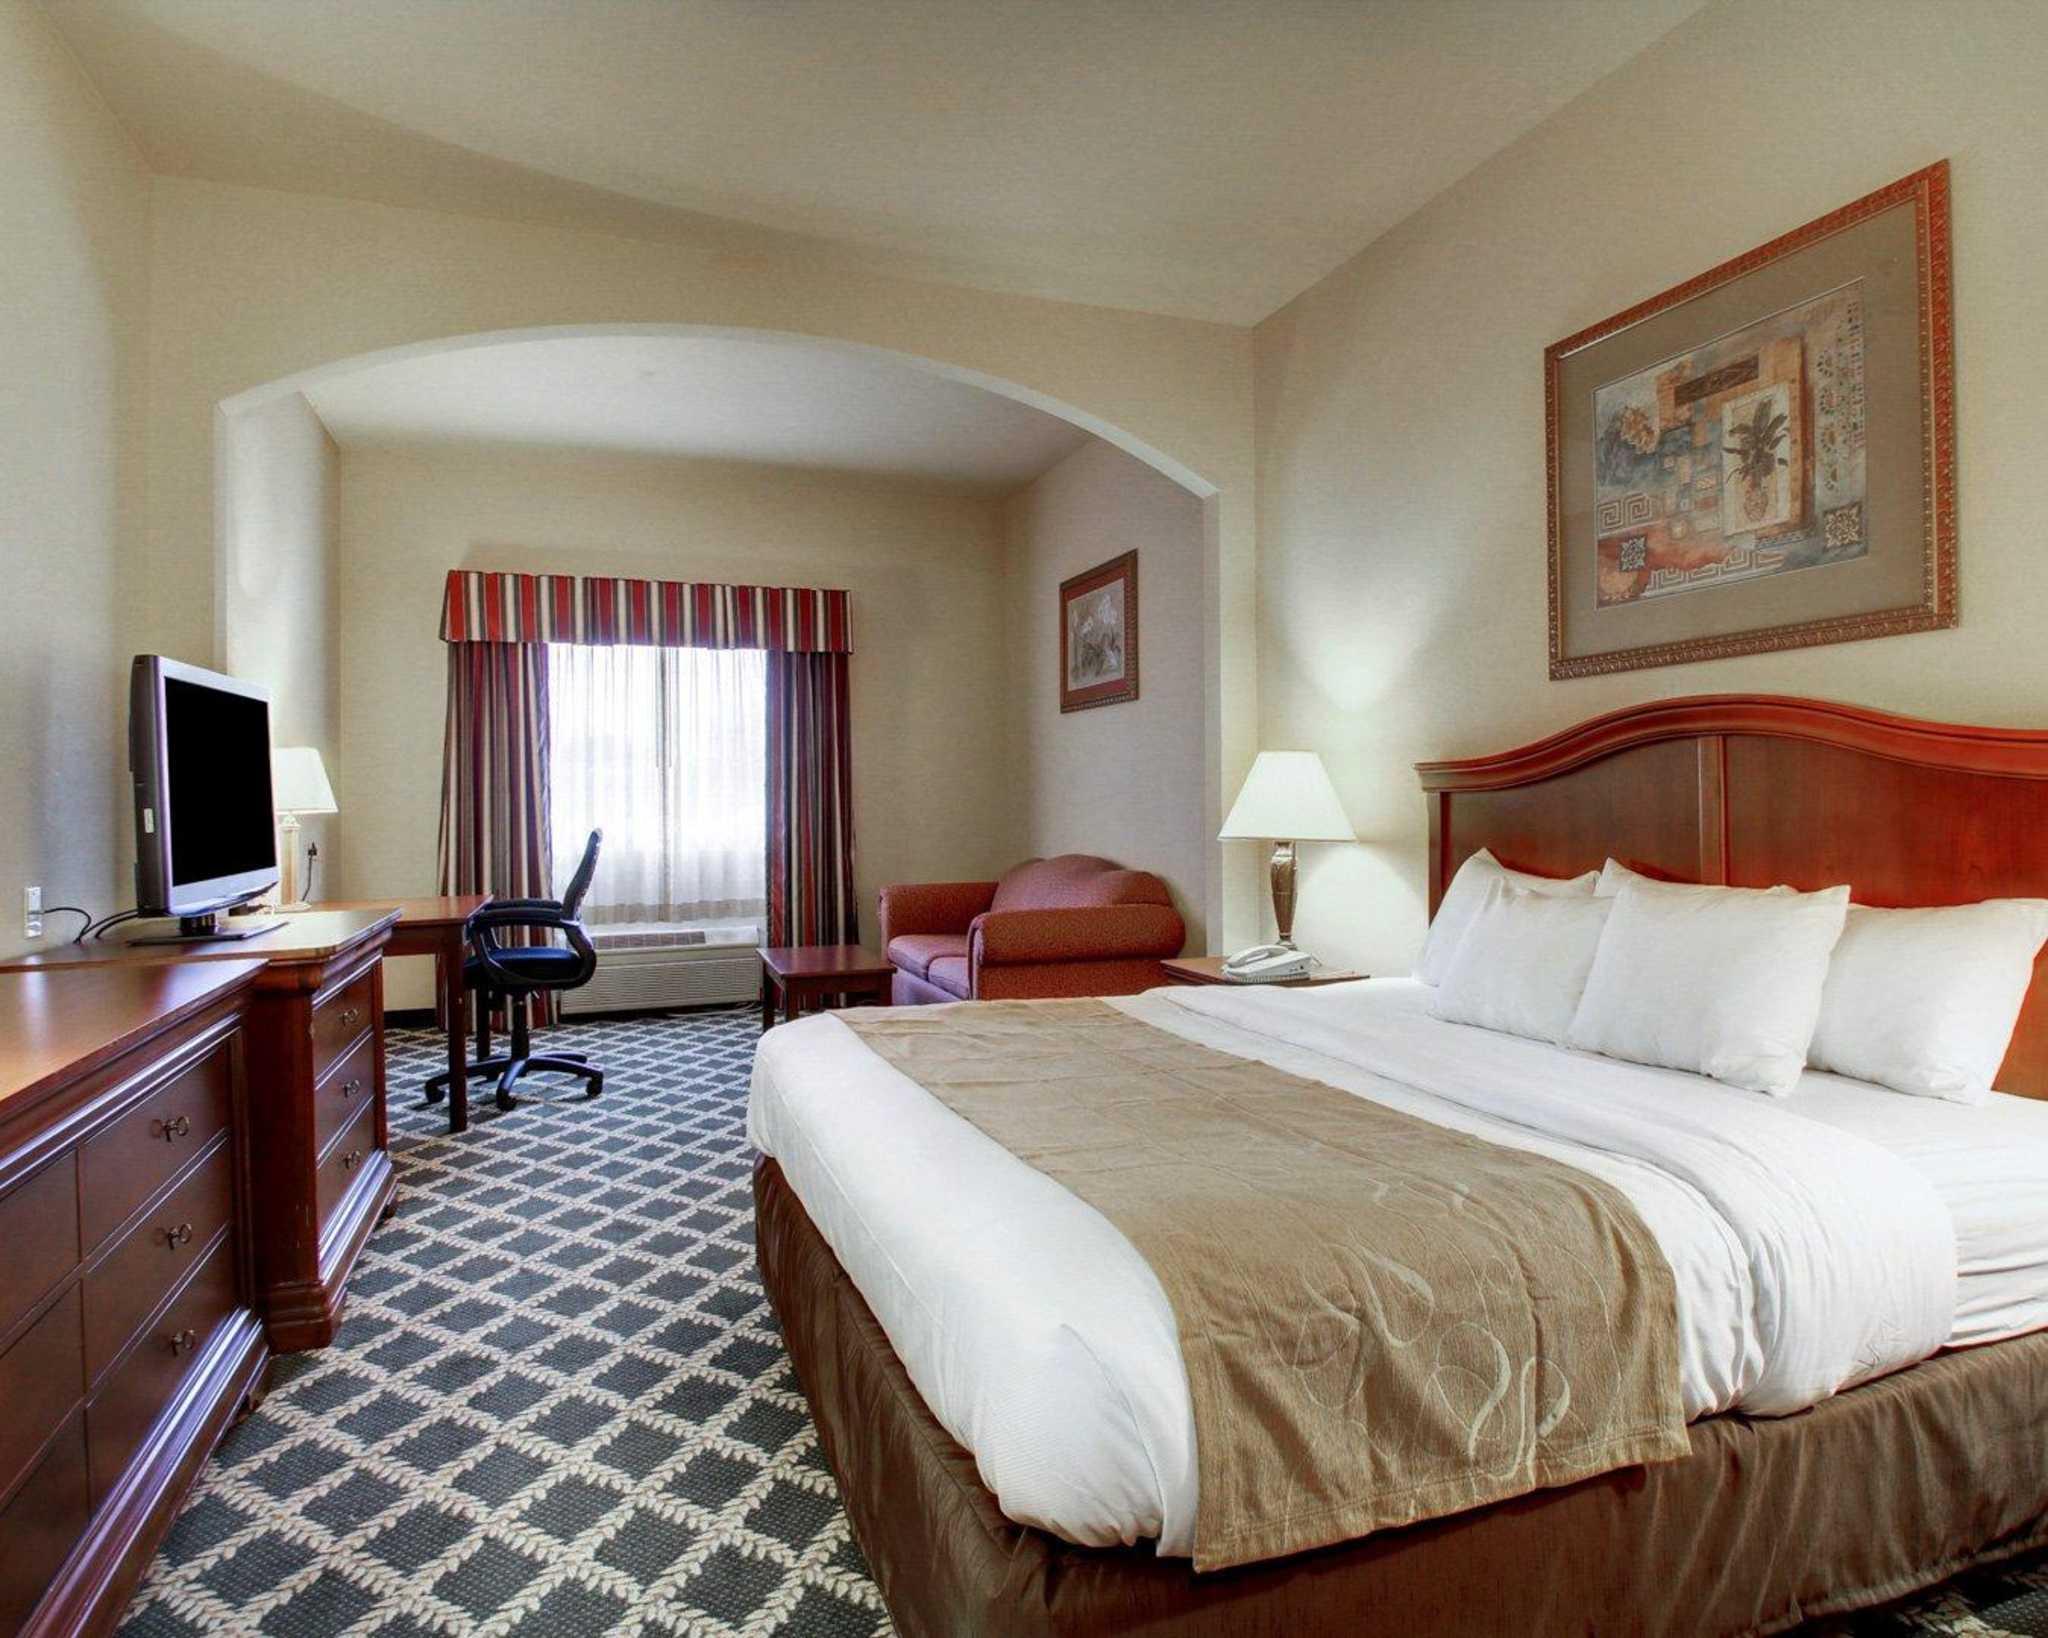 Comfort Suites image 23